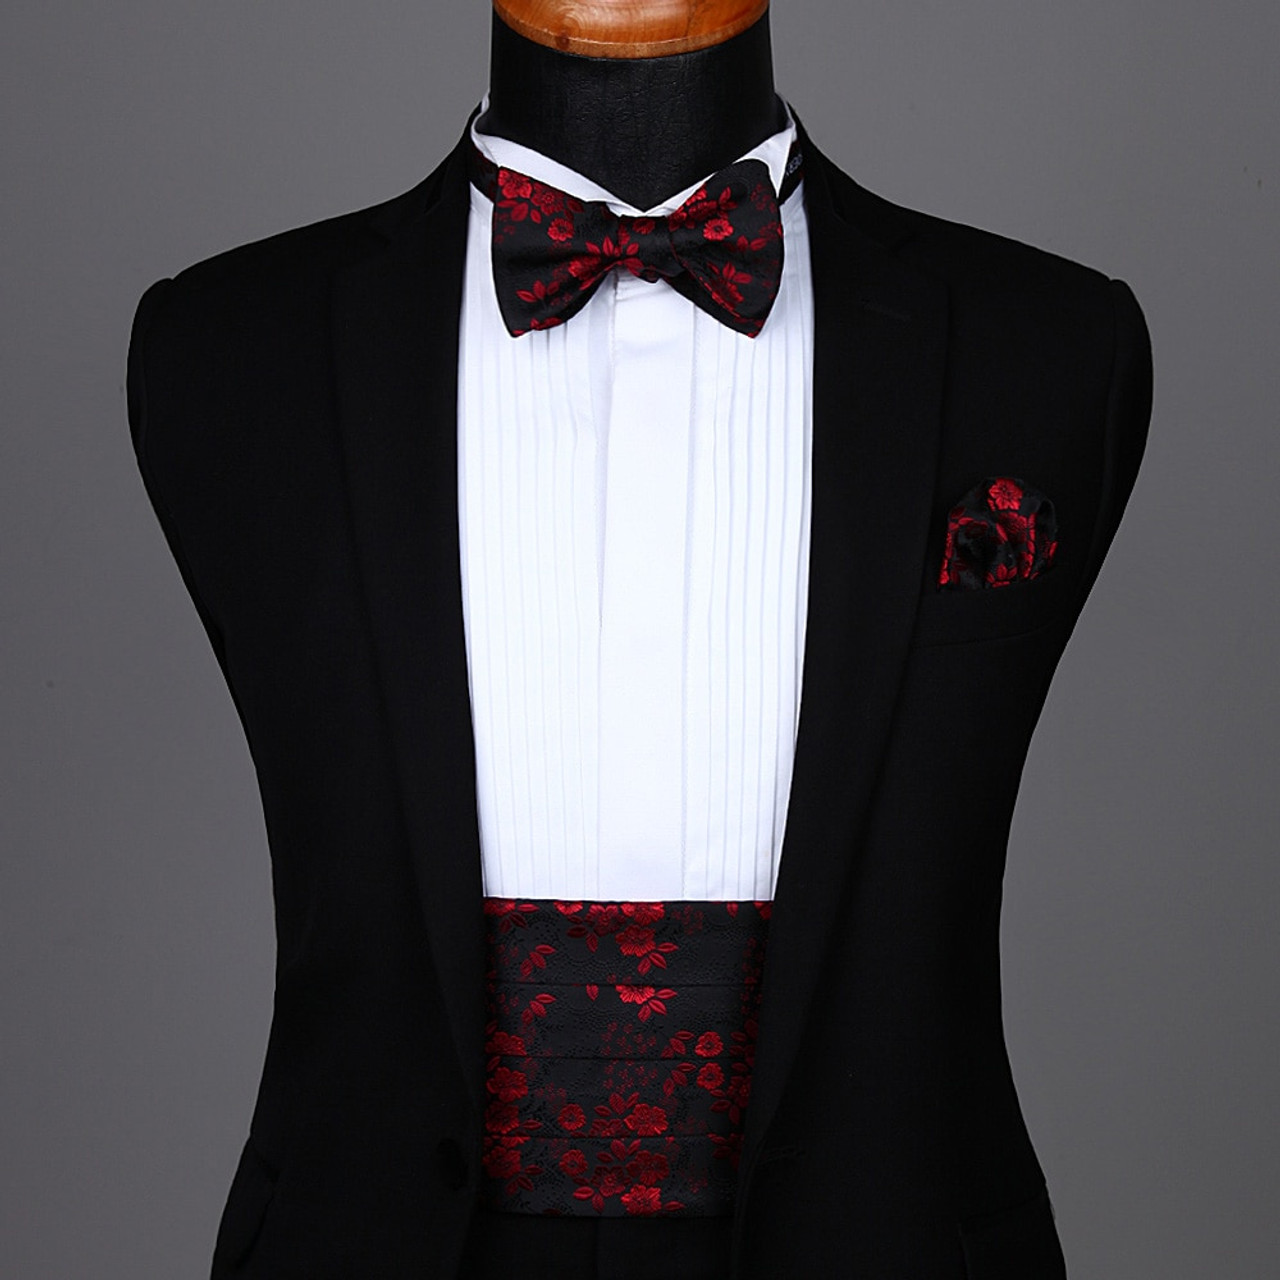 New men/'s polyester paisley burgundy hankie pocket square formal wedding party